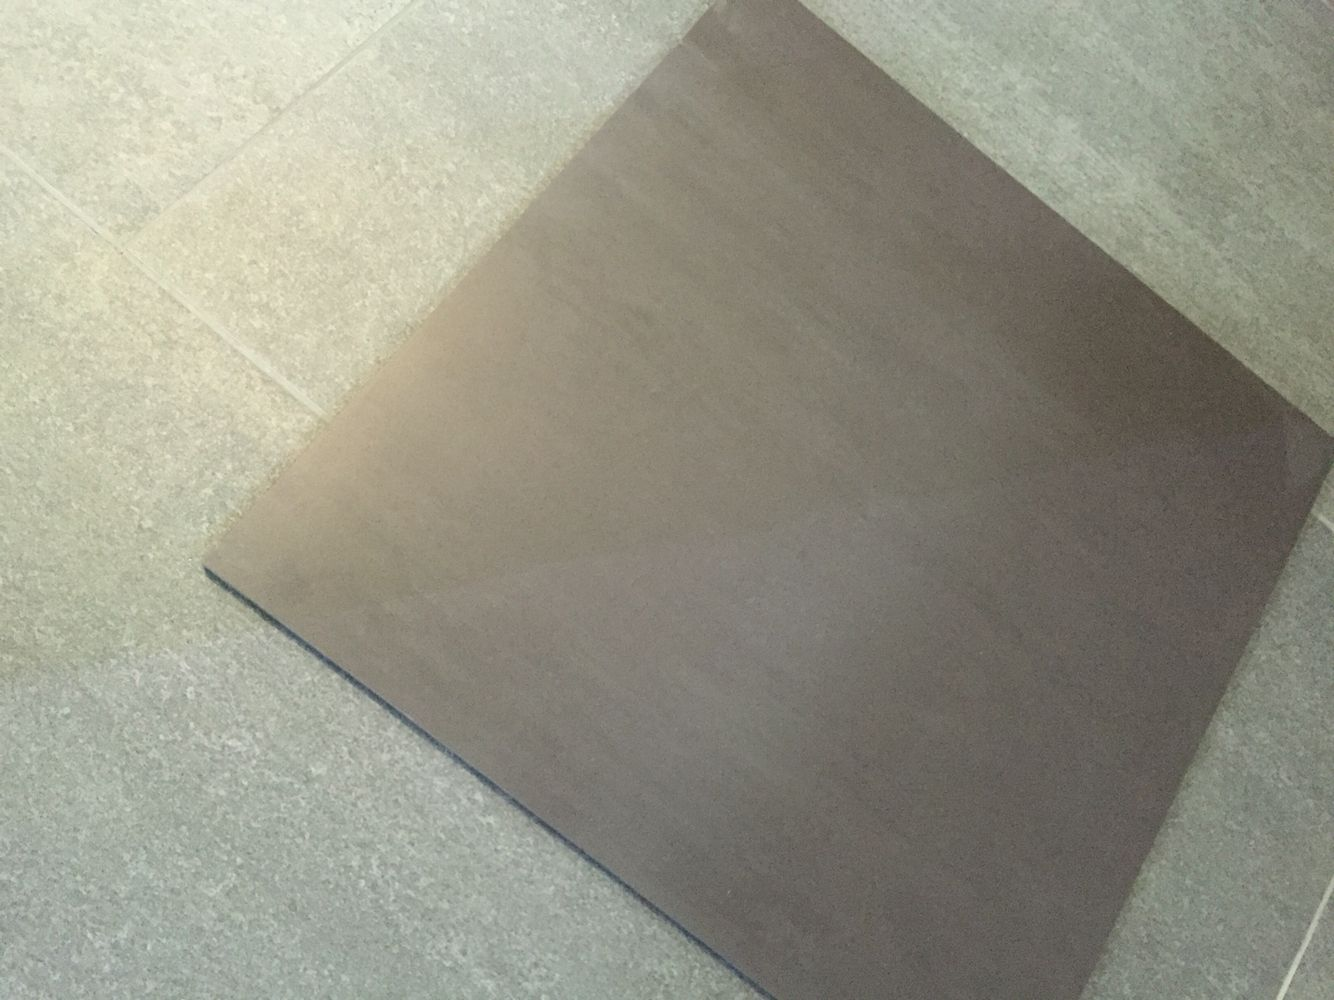 Rak Tegels 60x60 : Rak earthstone dark brown cm vloertegels rak